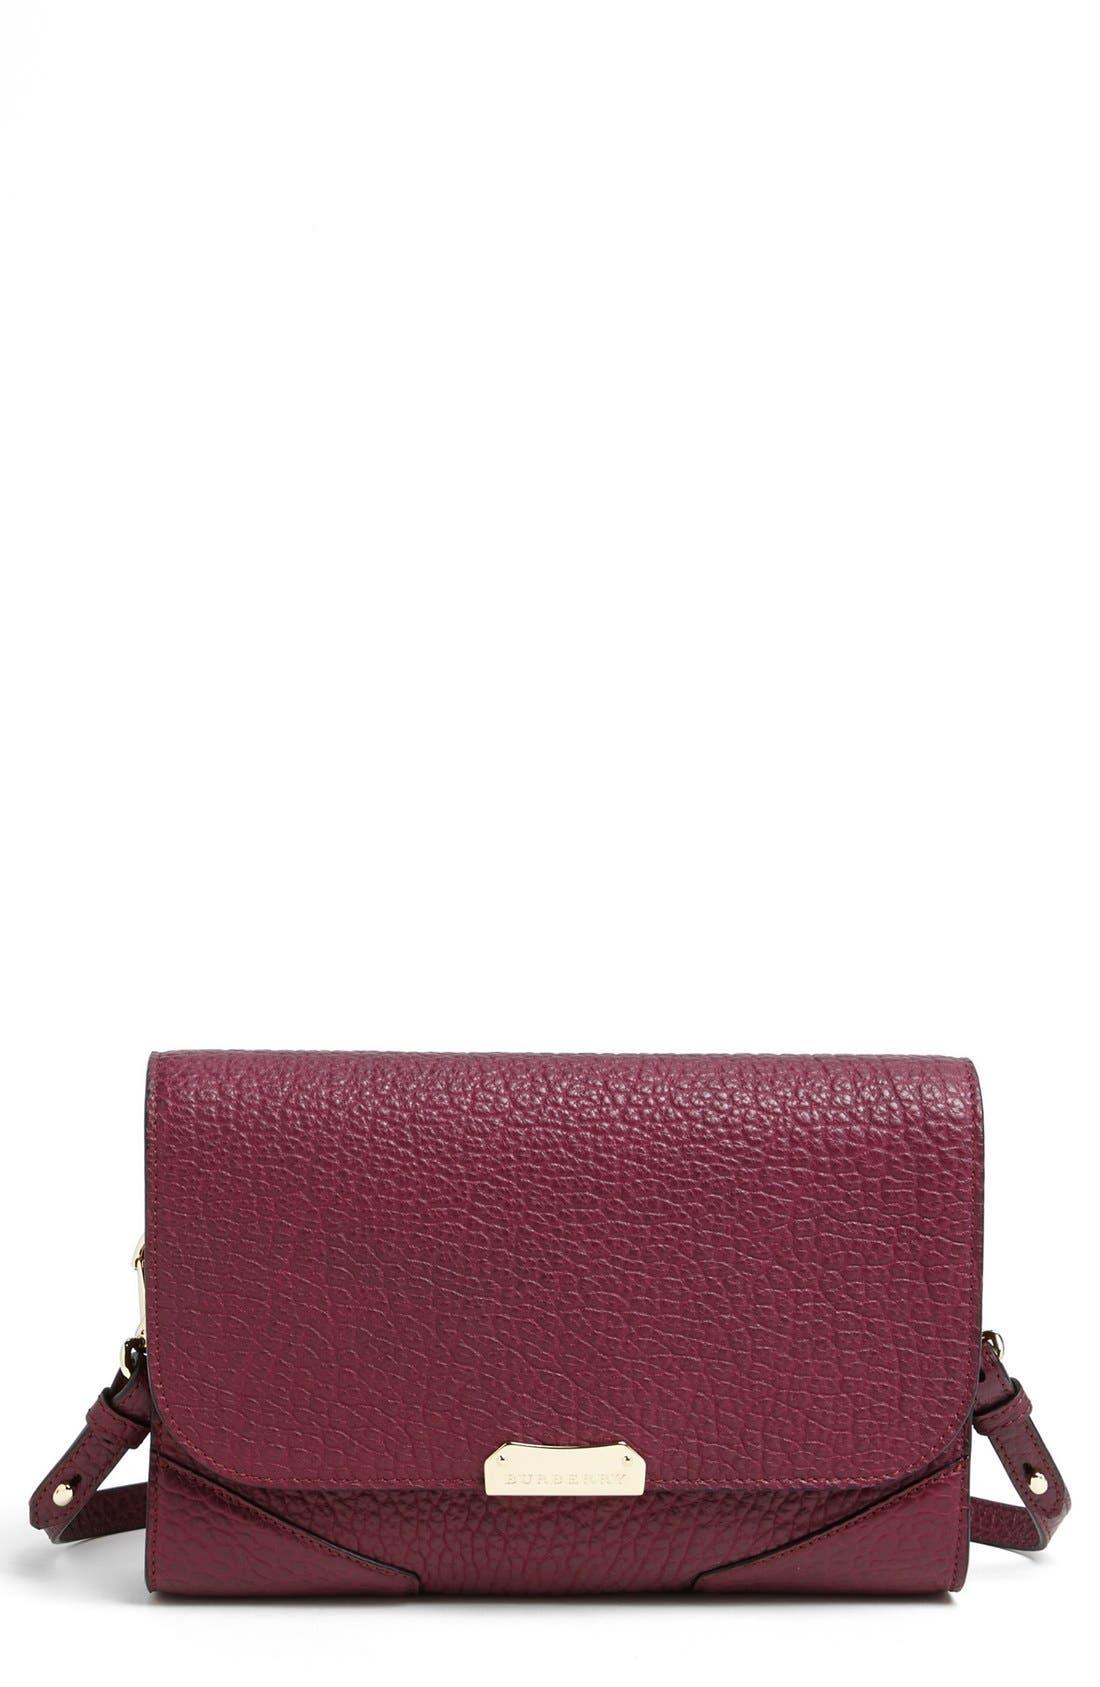 BURBERRY 'Abbott - Small' Crossbody Bag, Main, color, 510